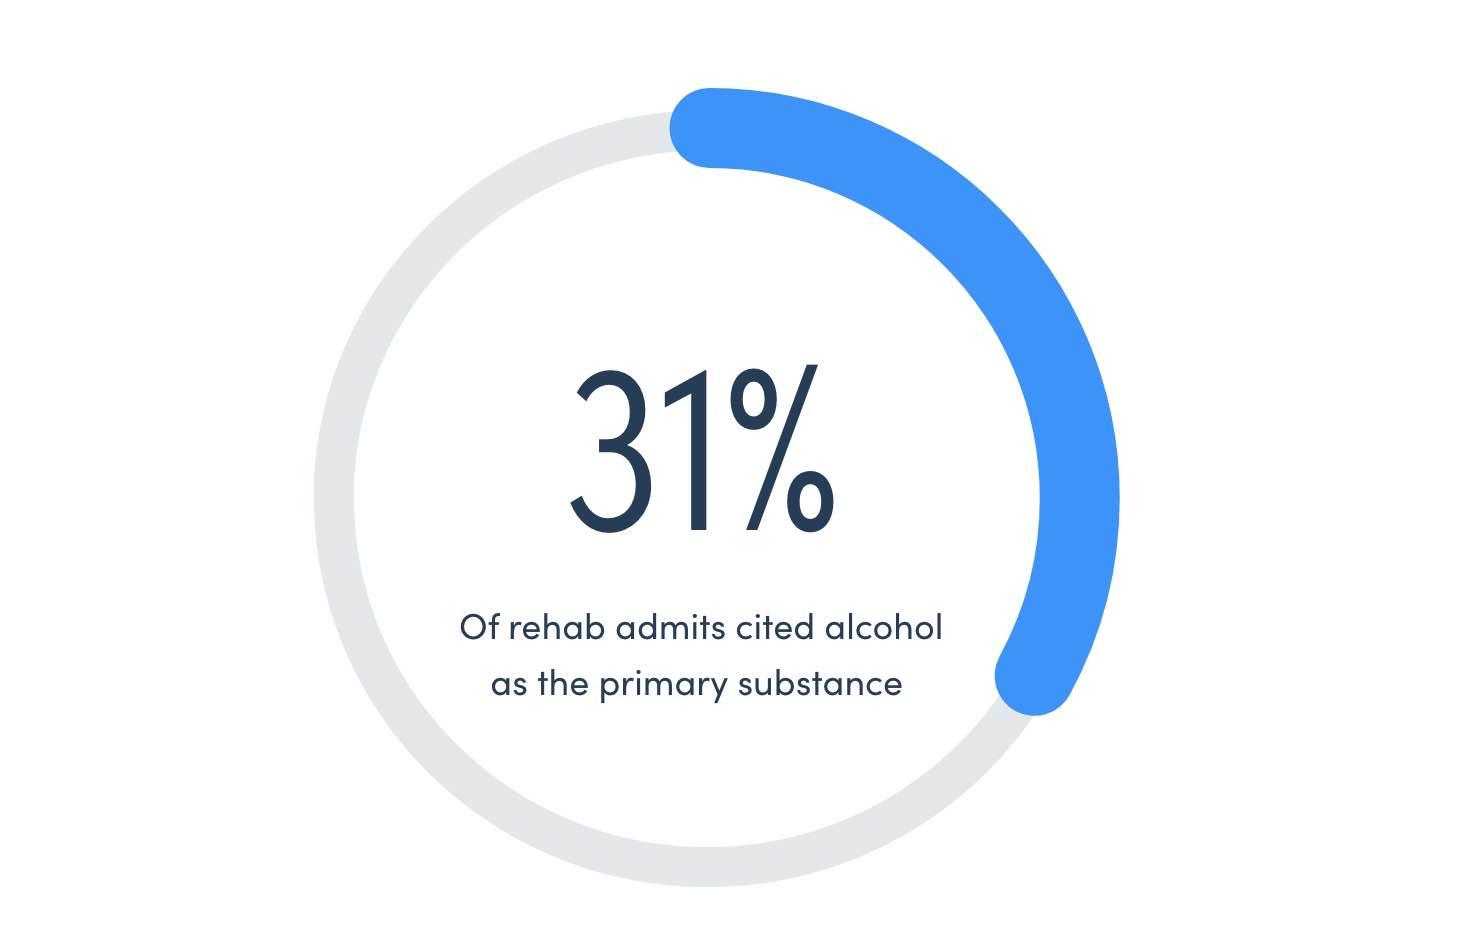 31% Who Go To Rehab Cite Alcohol As Their Drug Of Choice